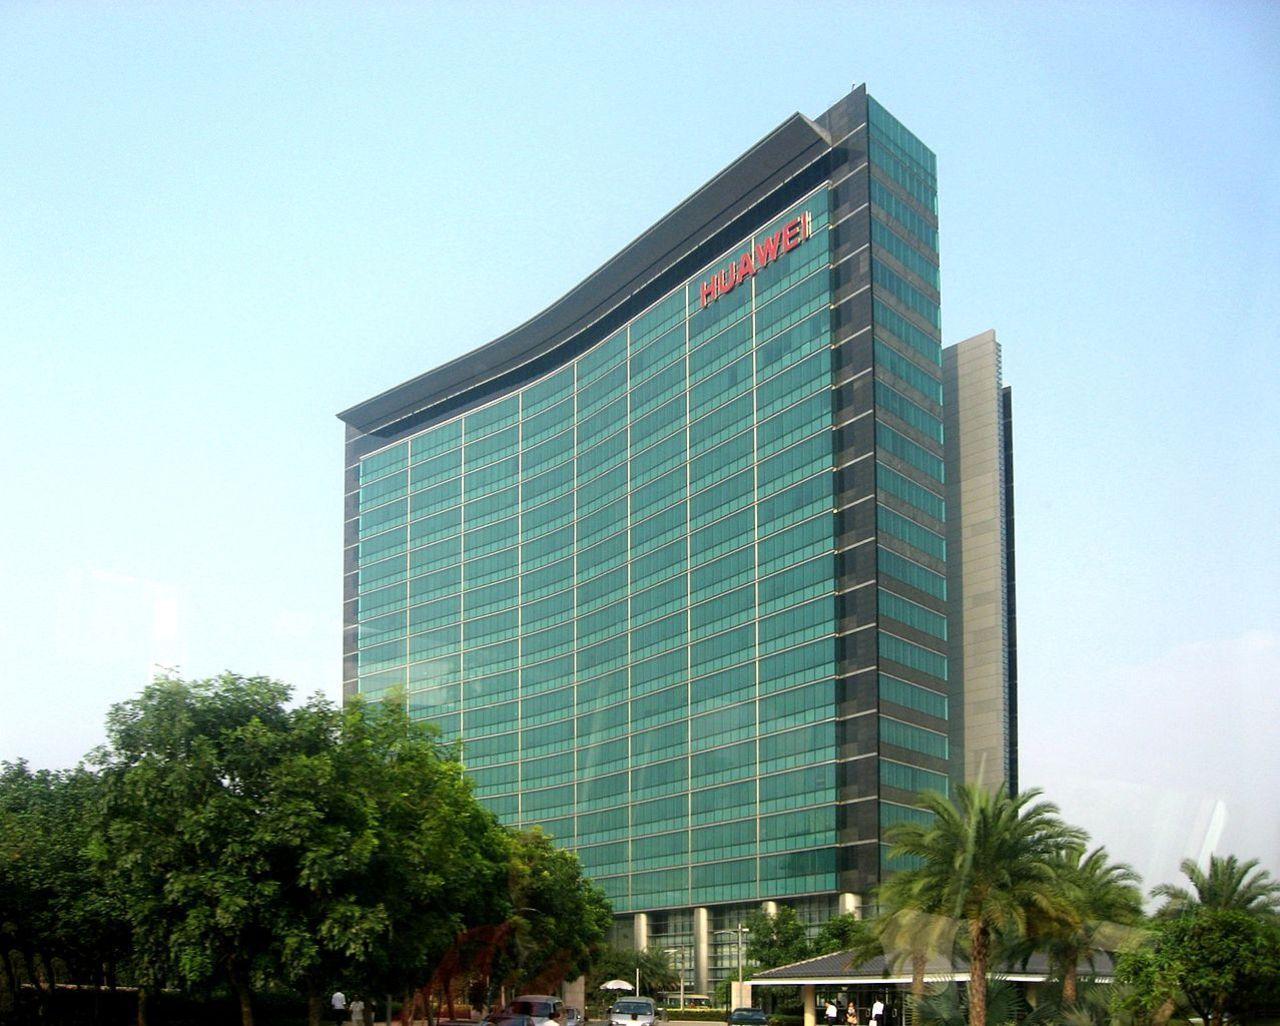 Fortsatt oklart om USA:s bojkott mot Huawei delvis lyfts